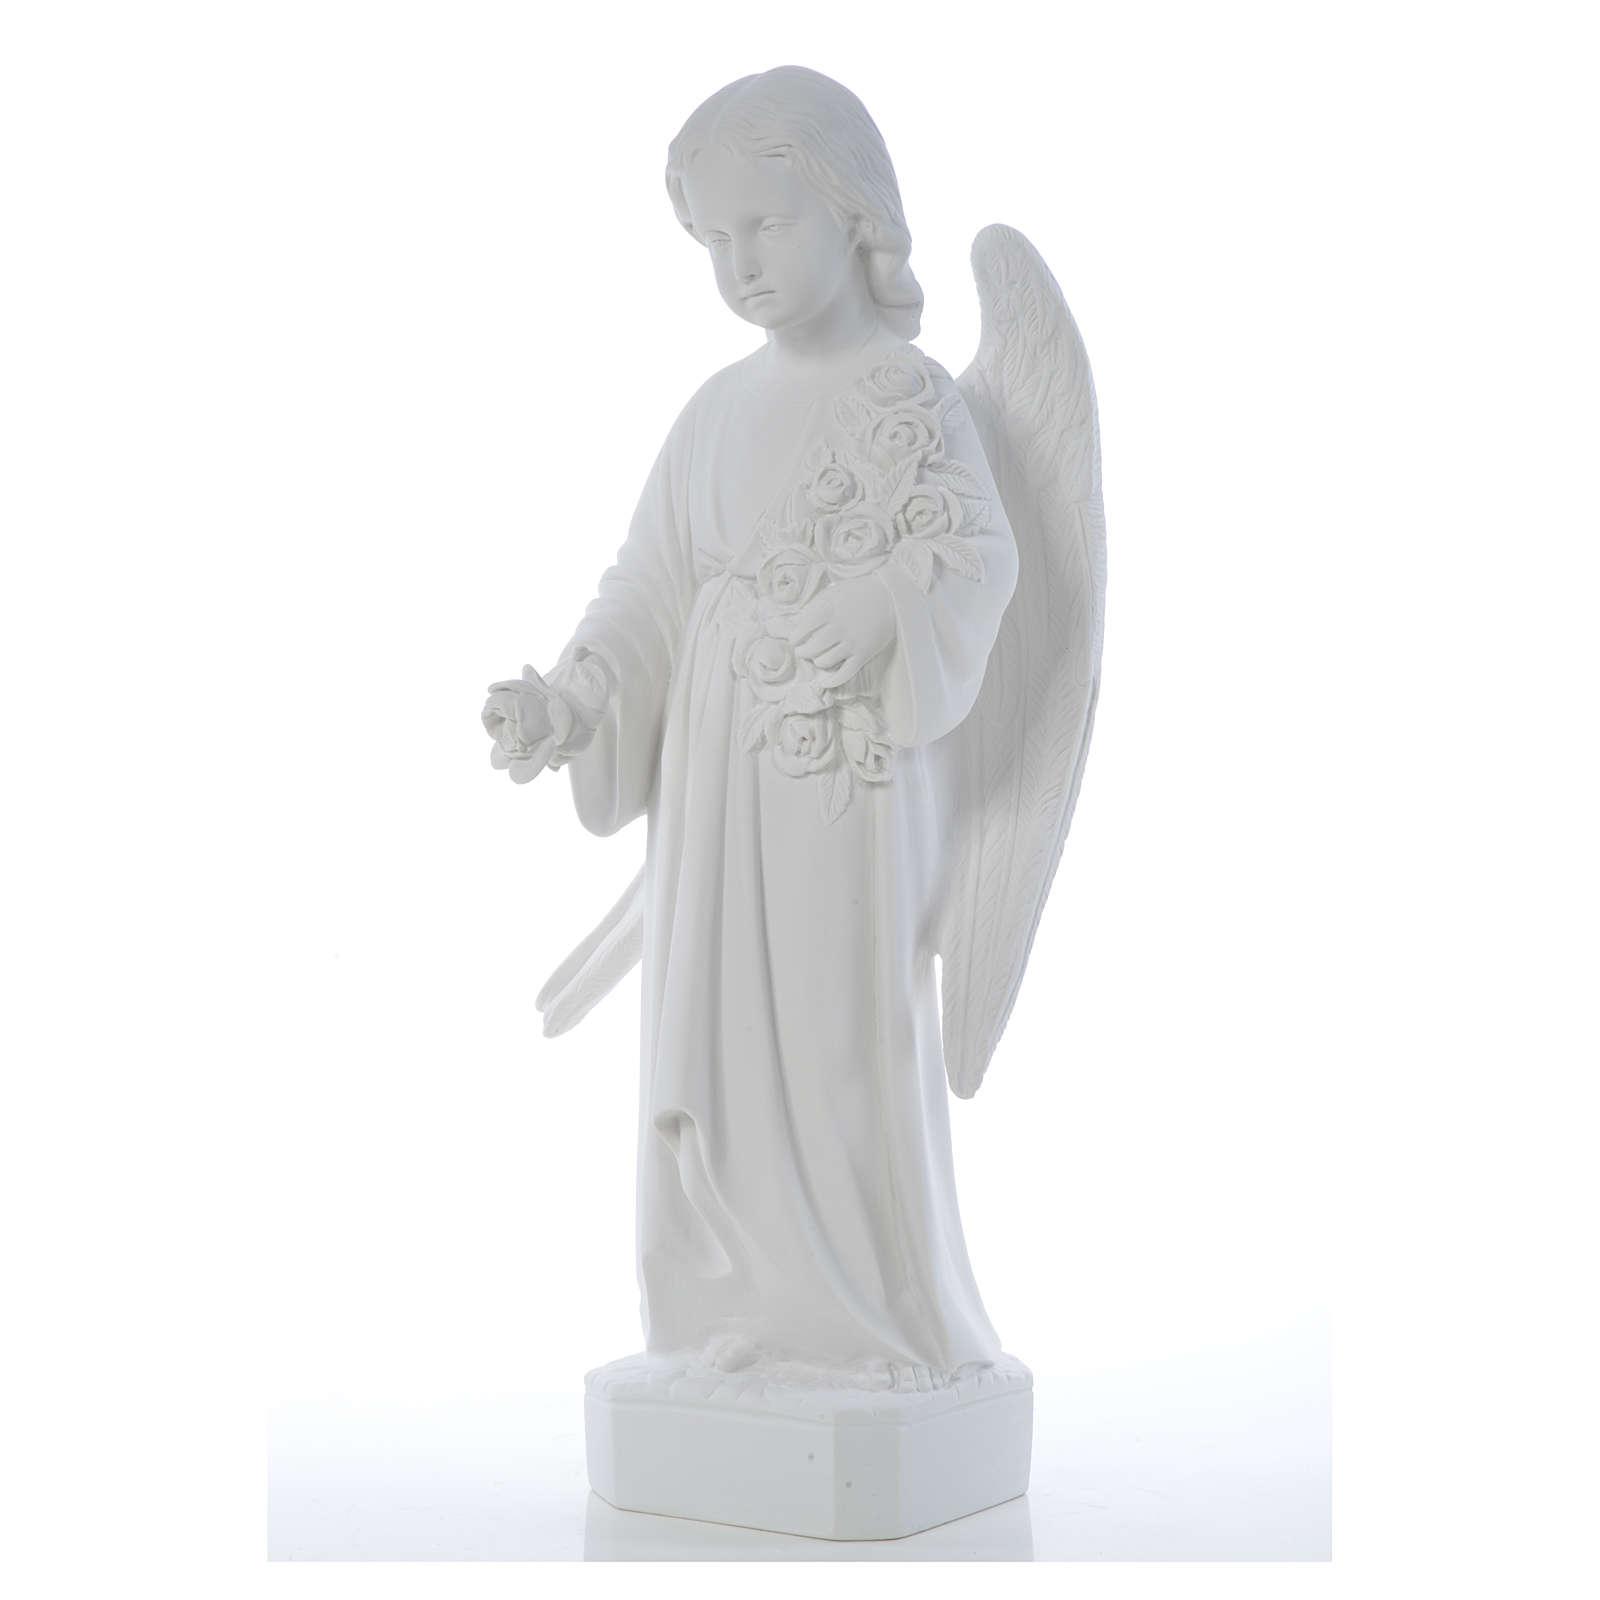 Angelo ali lunghe 60 cm marmo bianco 4